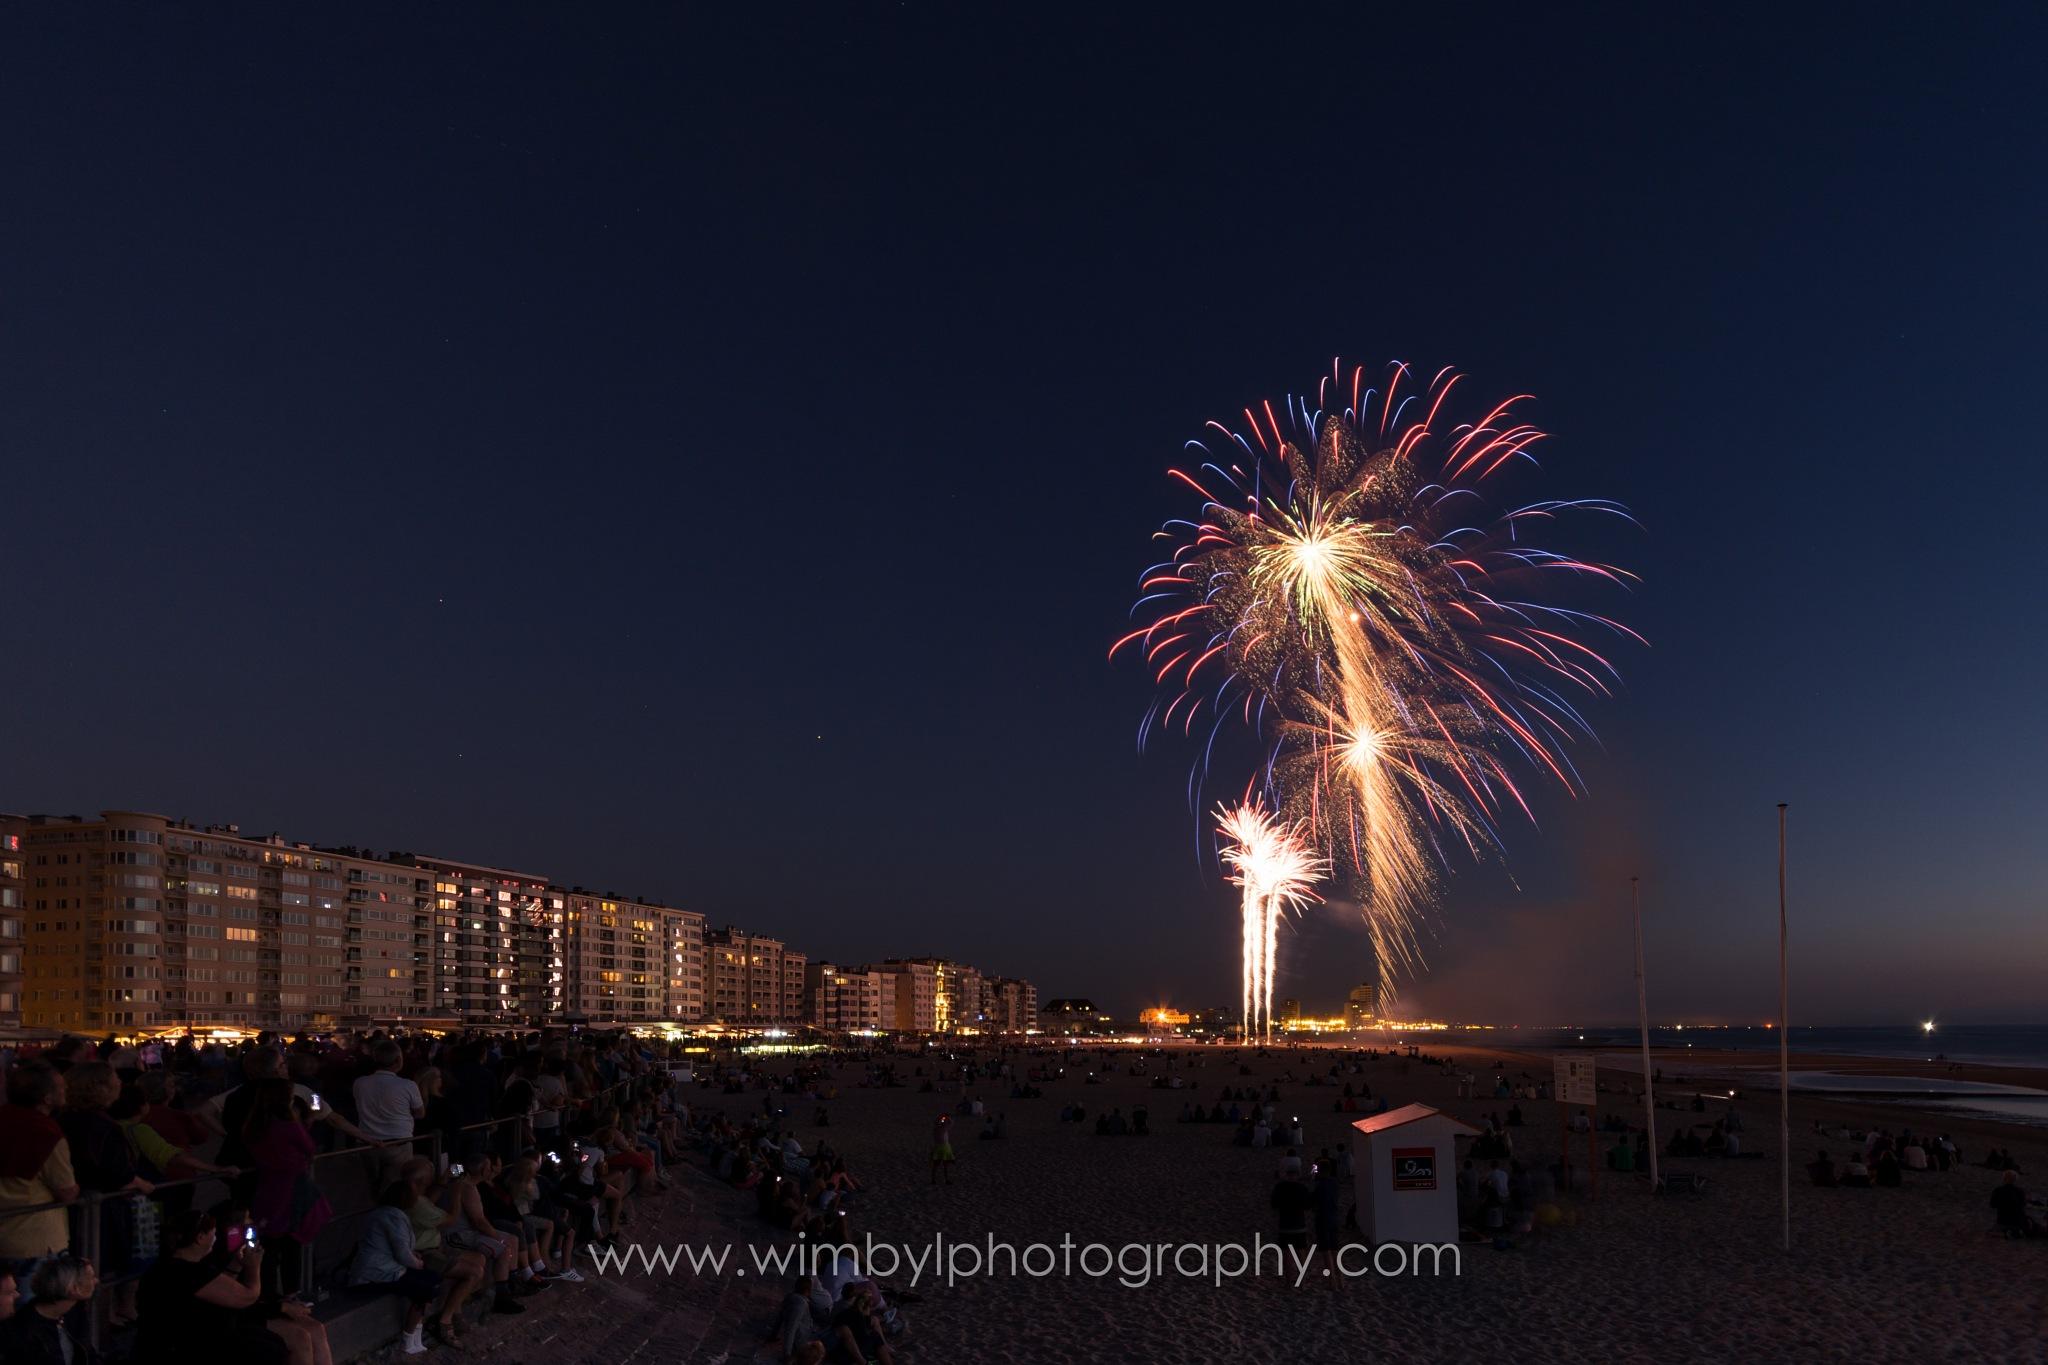 Fireworks at Ostend Beach Belgium by Wim Byl